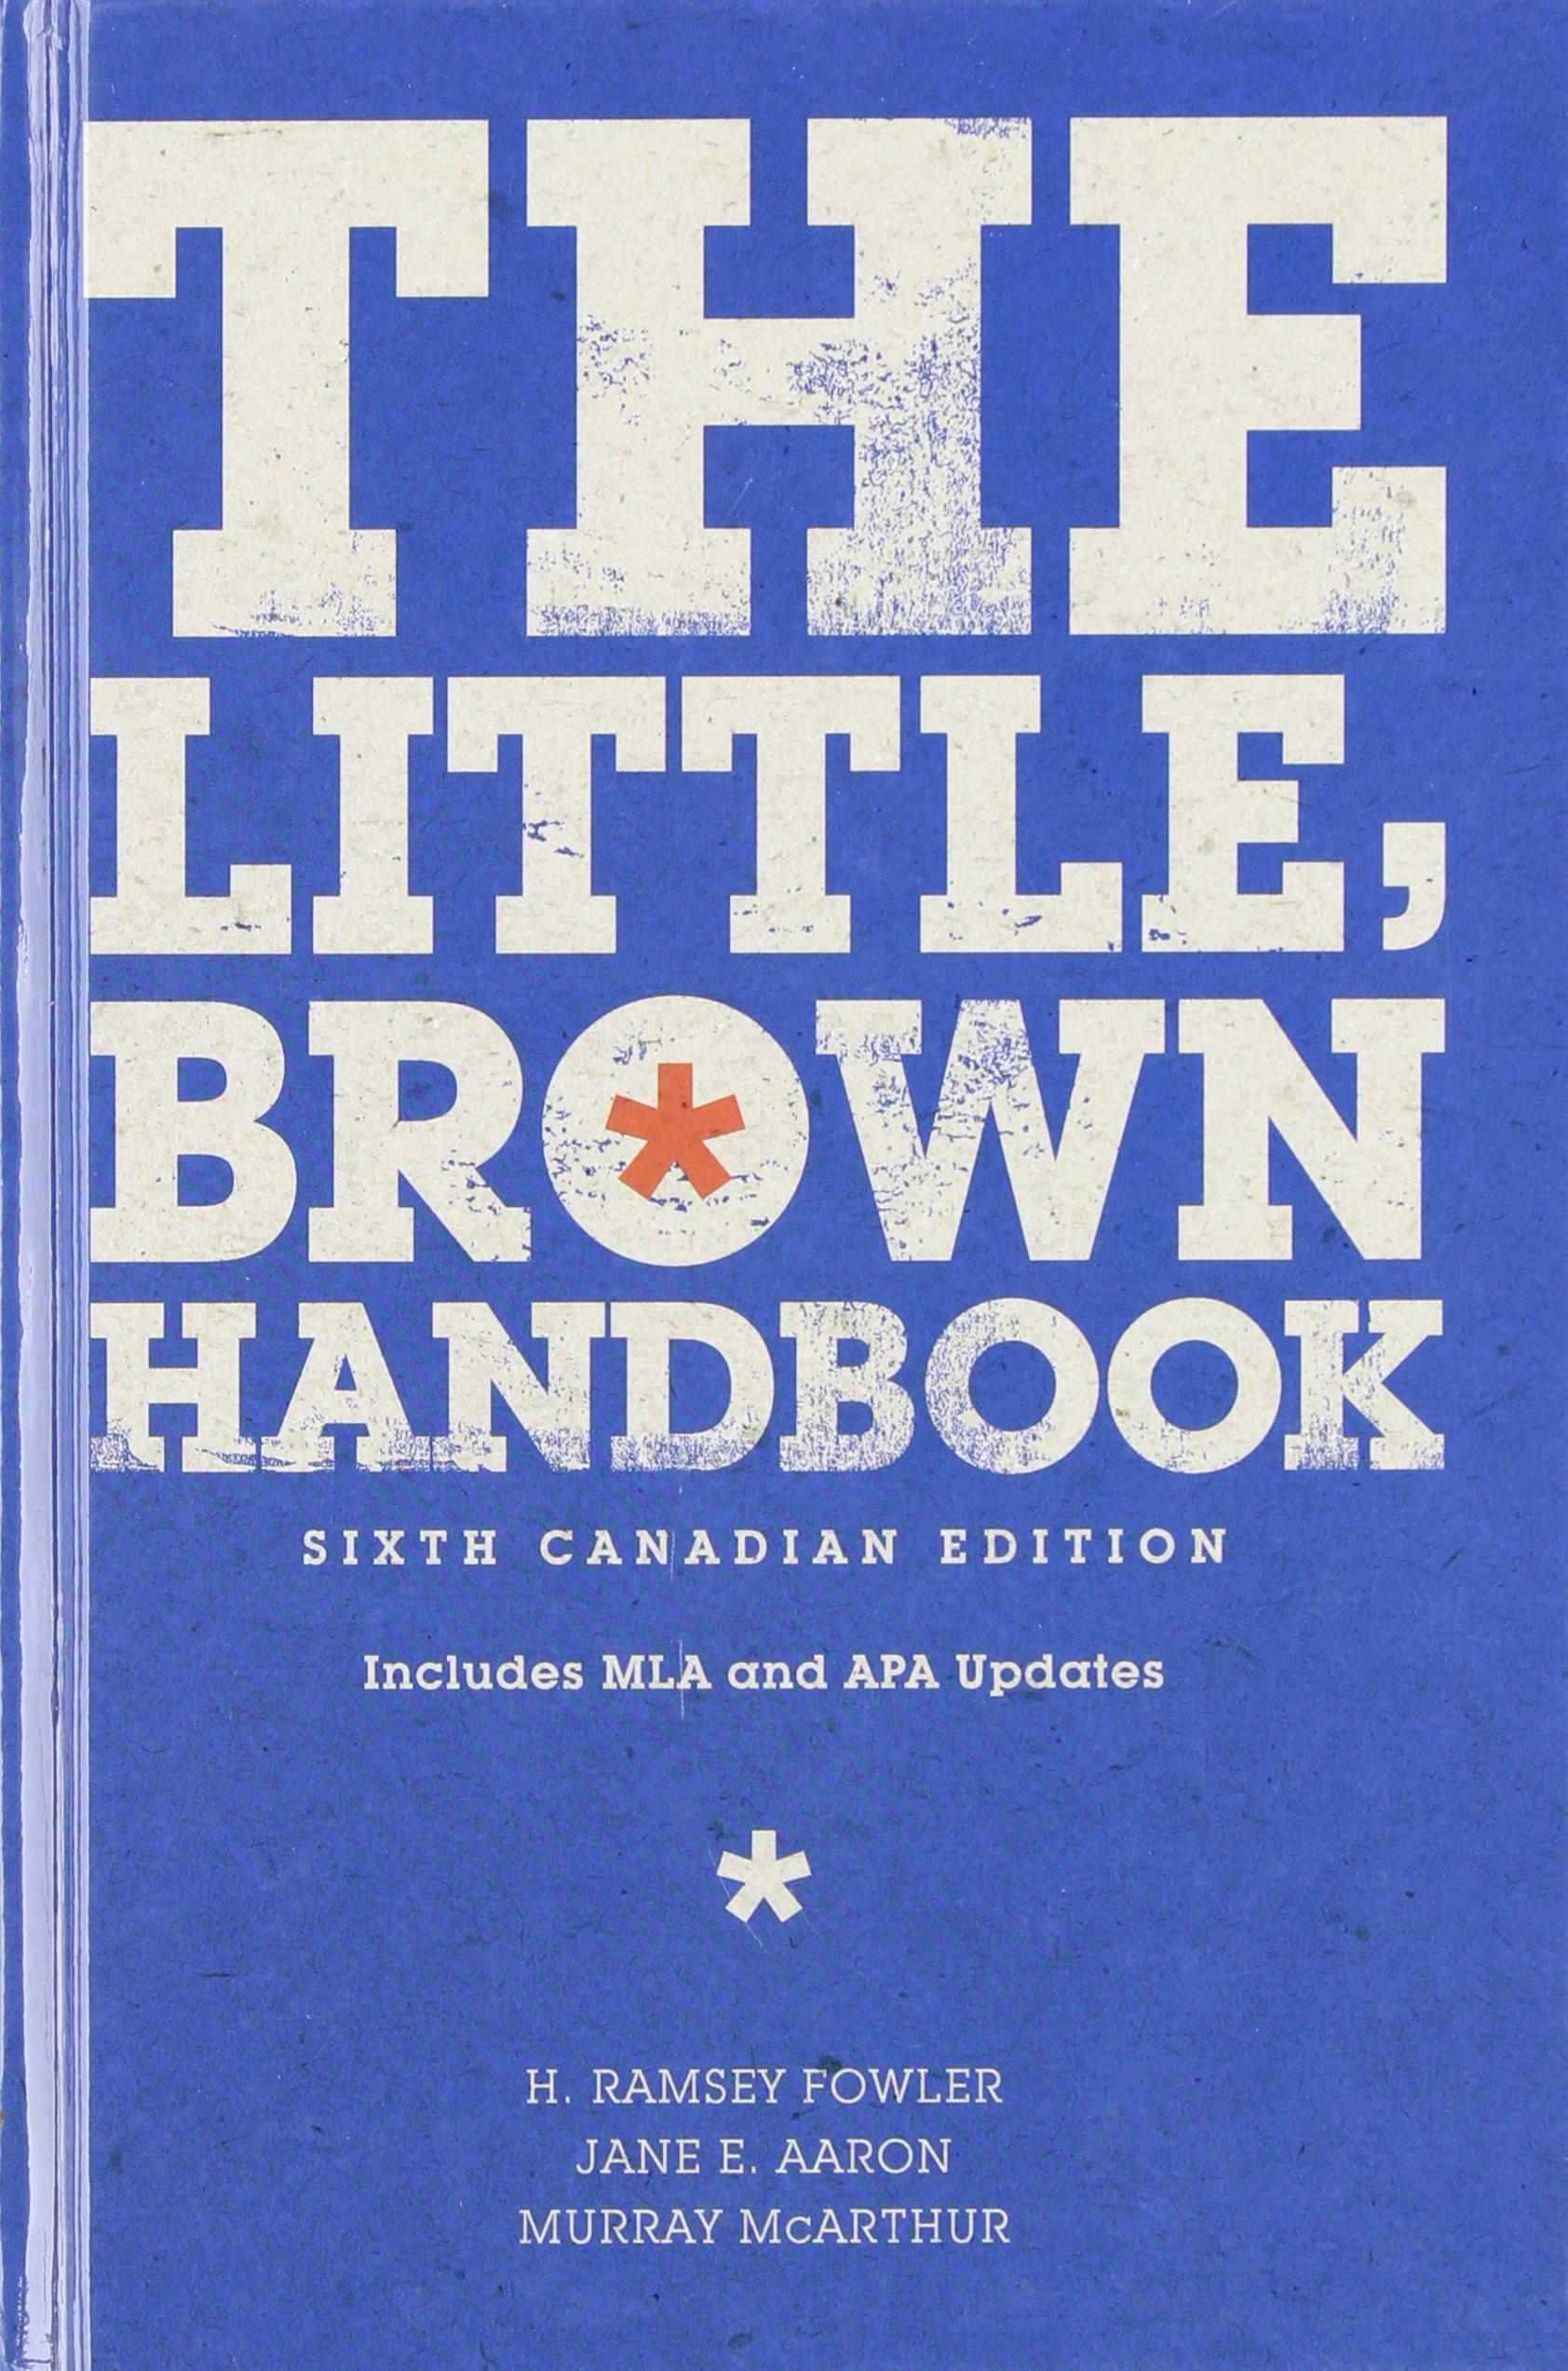 The Little, Brown Handbook, Sixth Canadian Edition (6th Edition): H. Ramsey  Fowler, Jane E. Aaron, Murray McArthur: 9780321615374: Creative Writing ...